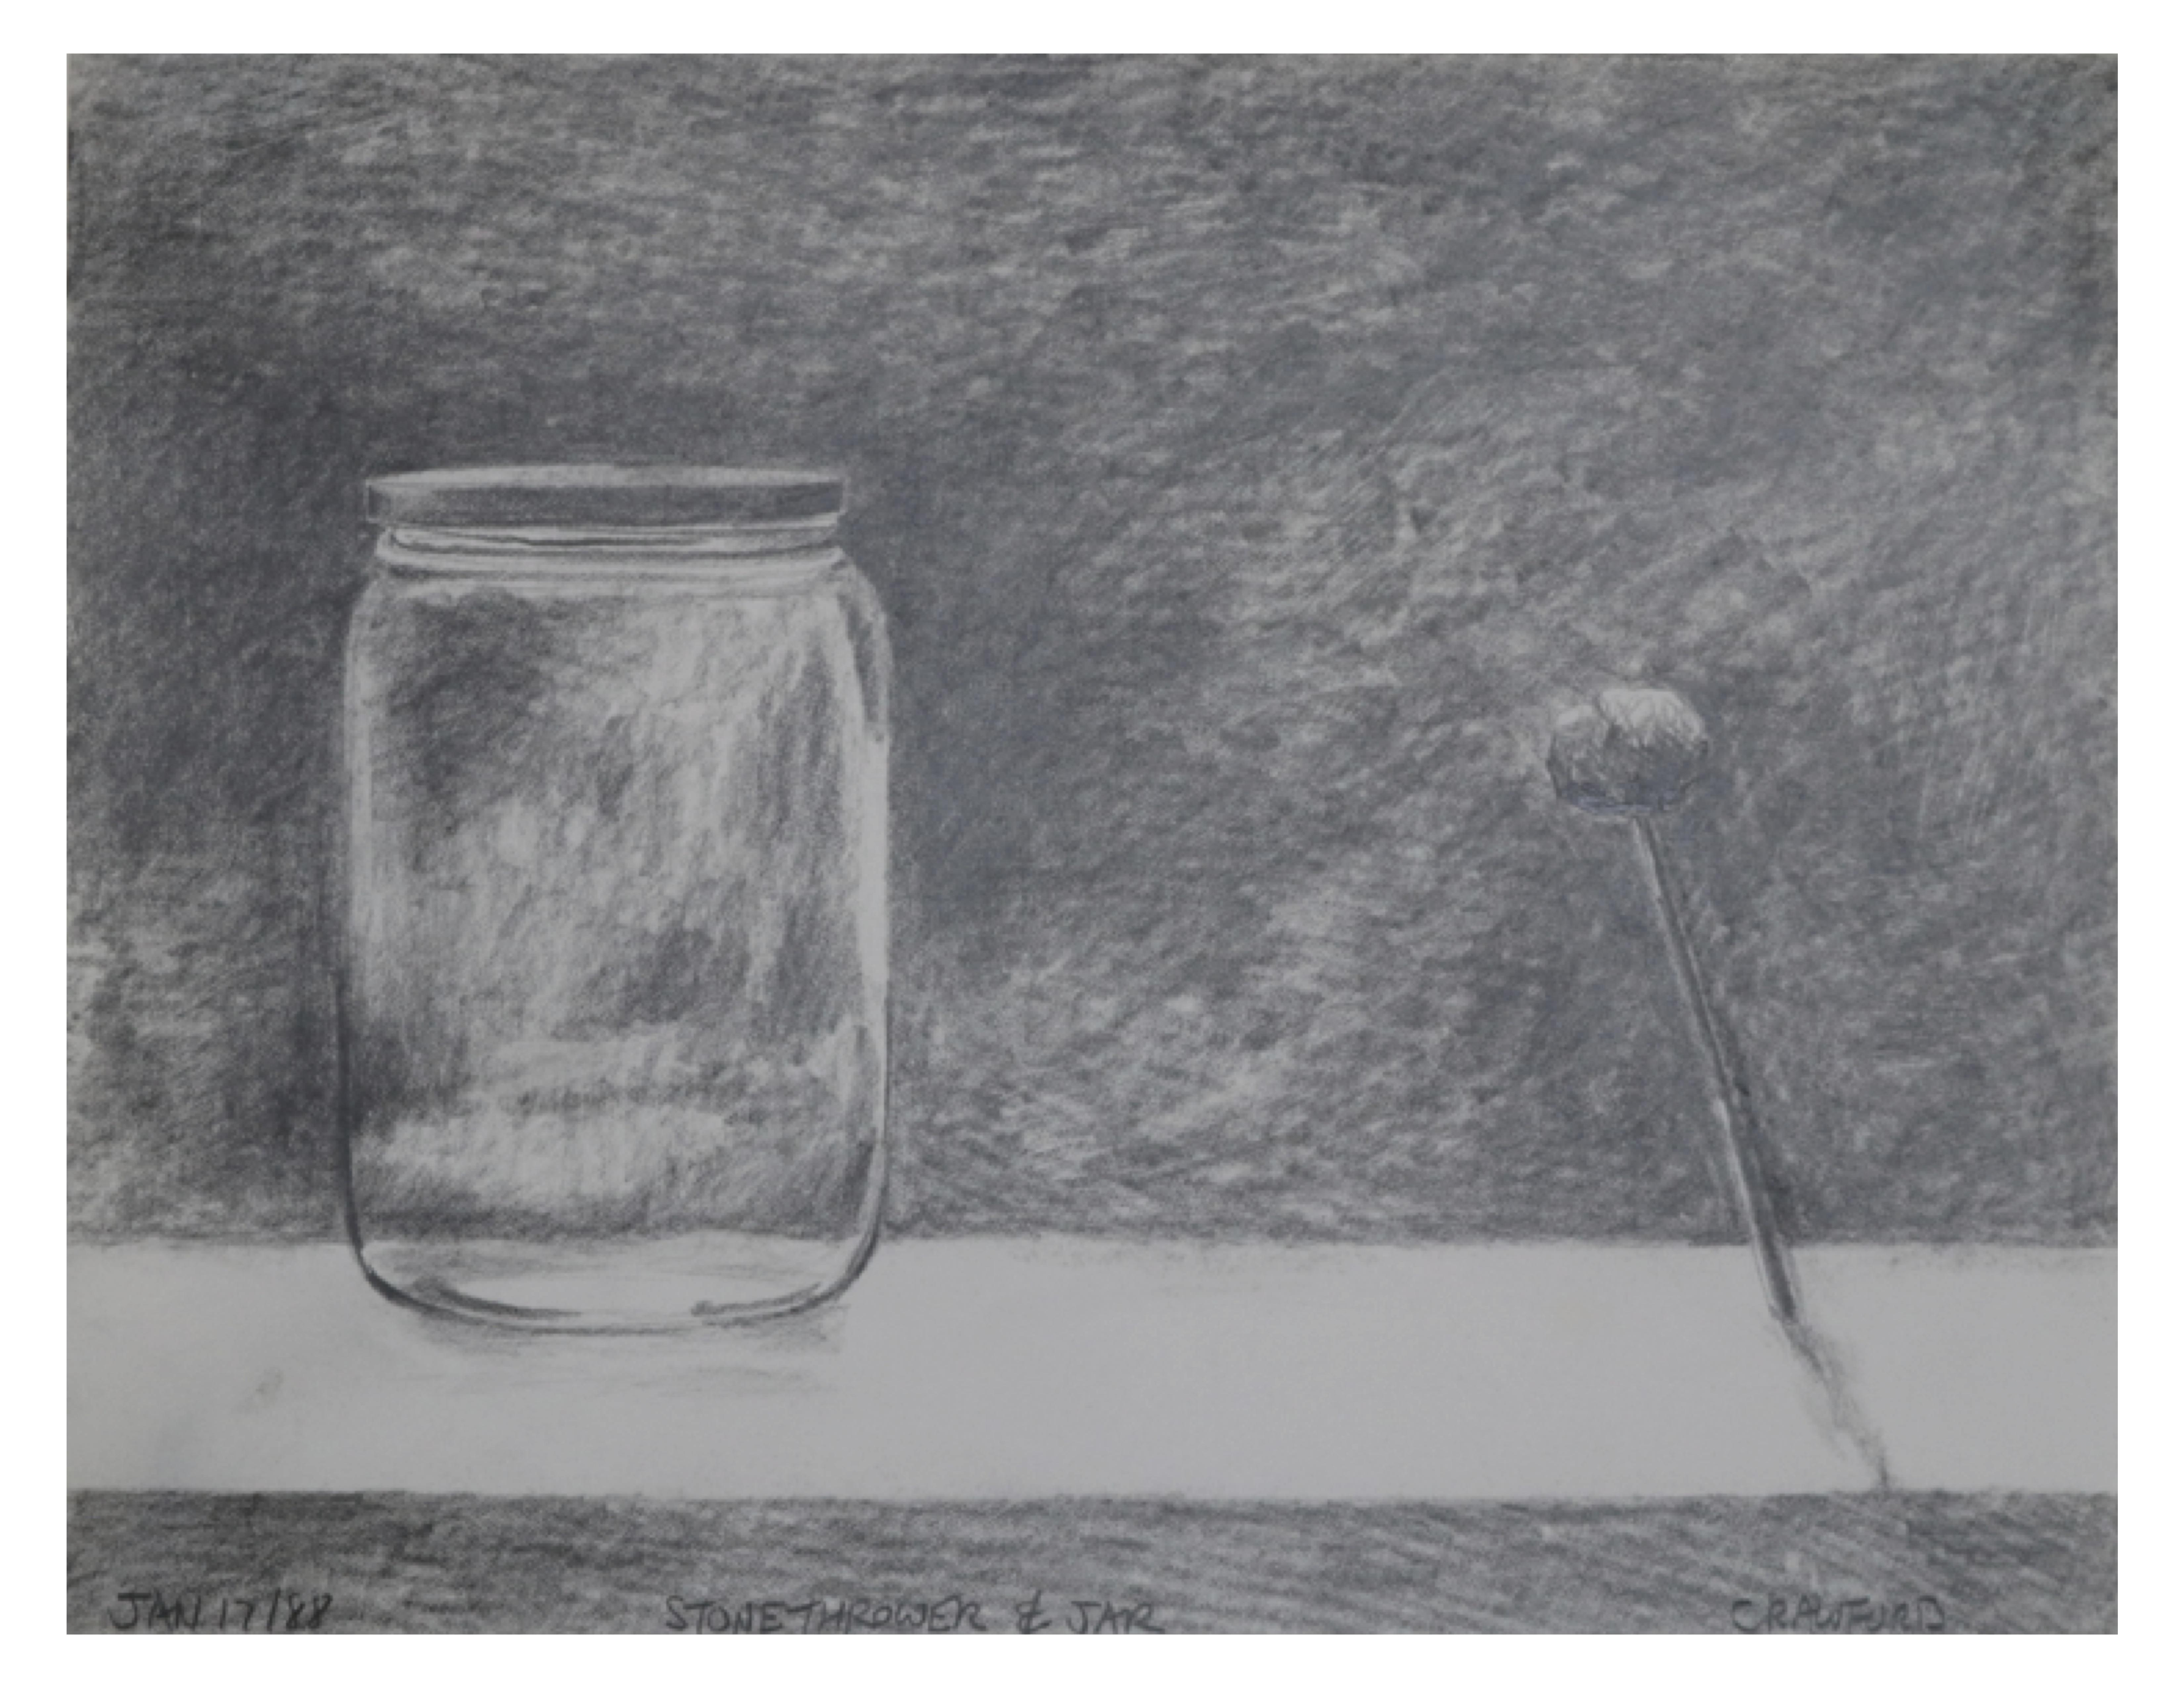 Stone thrower and jar, Jan 17, 1988, 27.9 cm x 21.6 cm